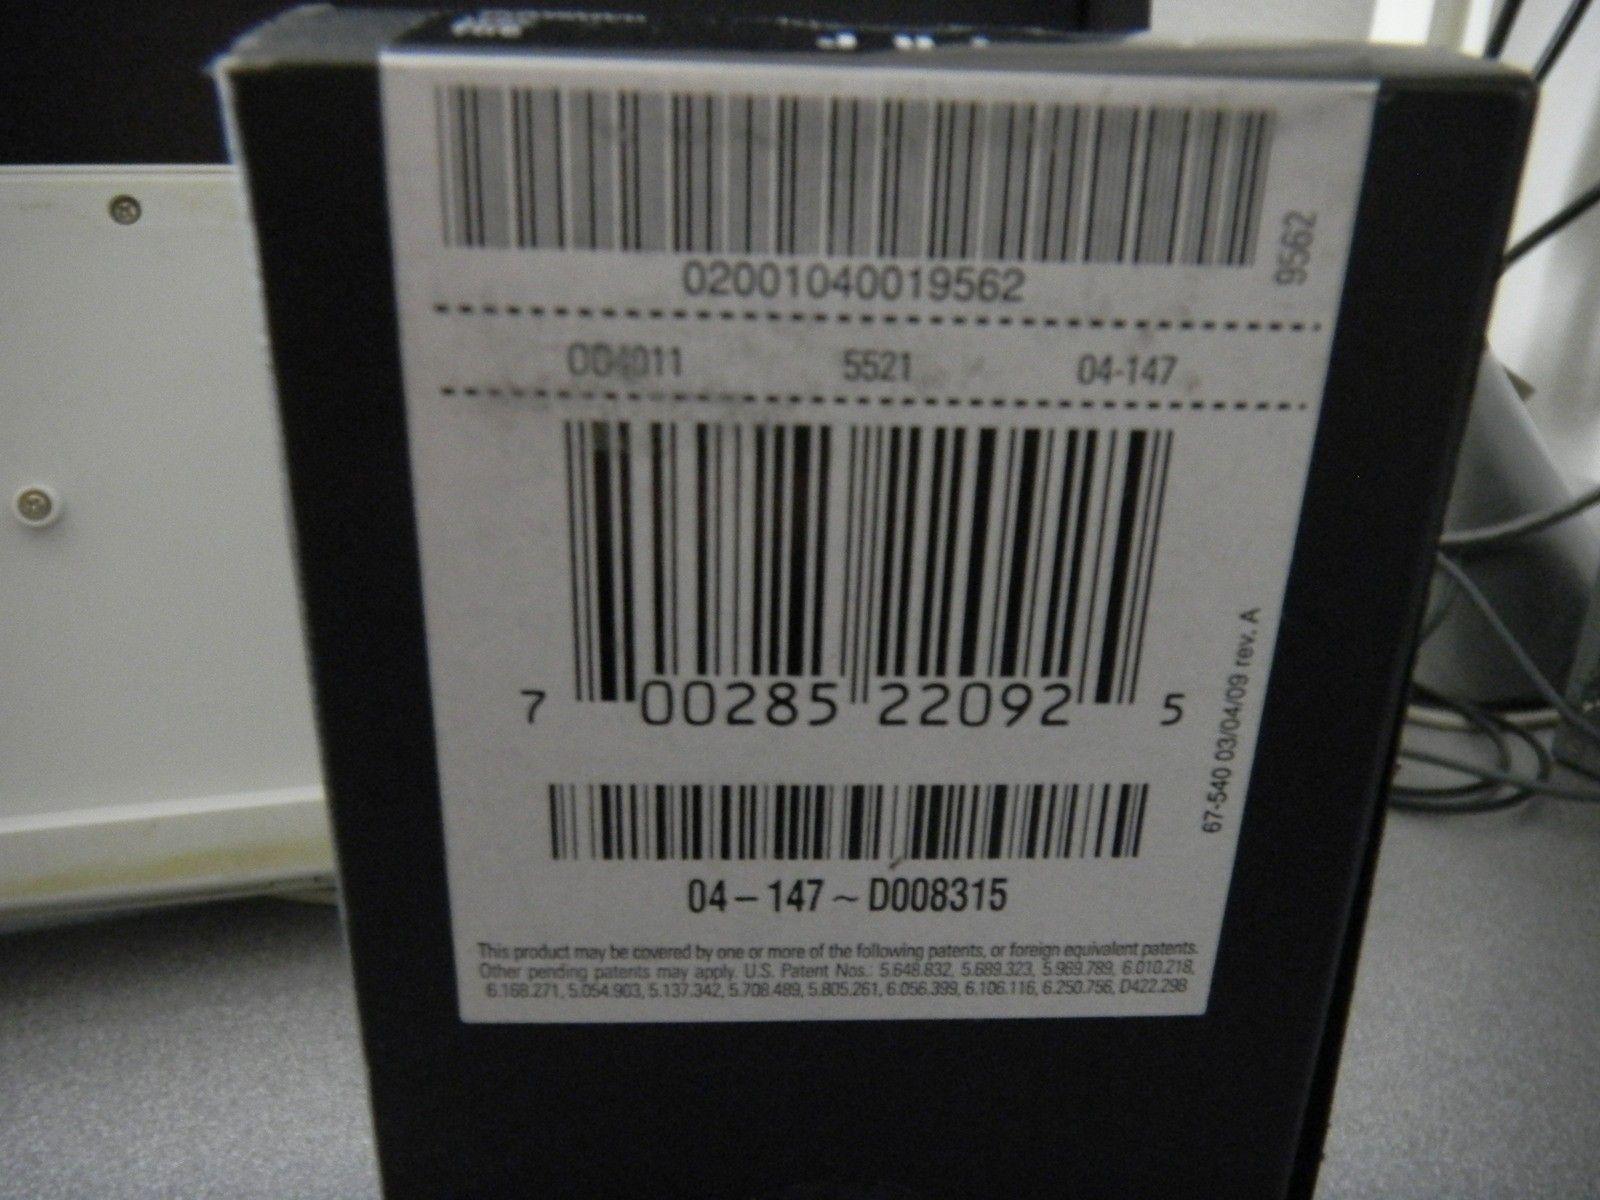 Juliet Polished With Fire Iridium Polarized Mint Complete Package - DSCN1552.JPG